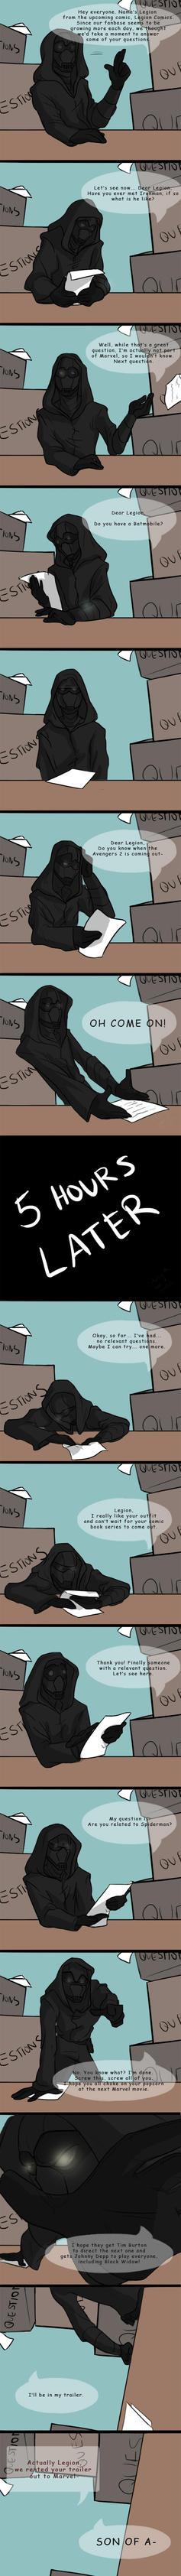 Struggles Of A Superhero by mistergleeson